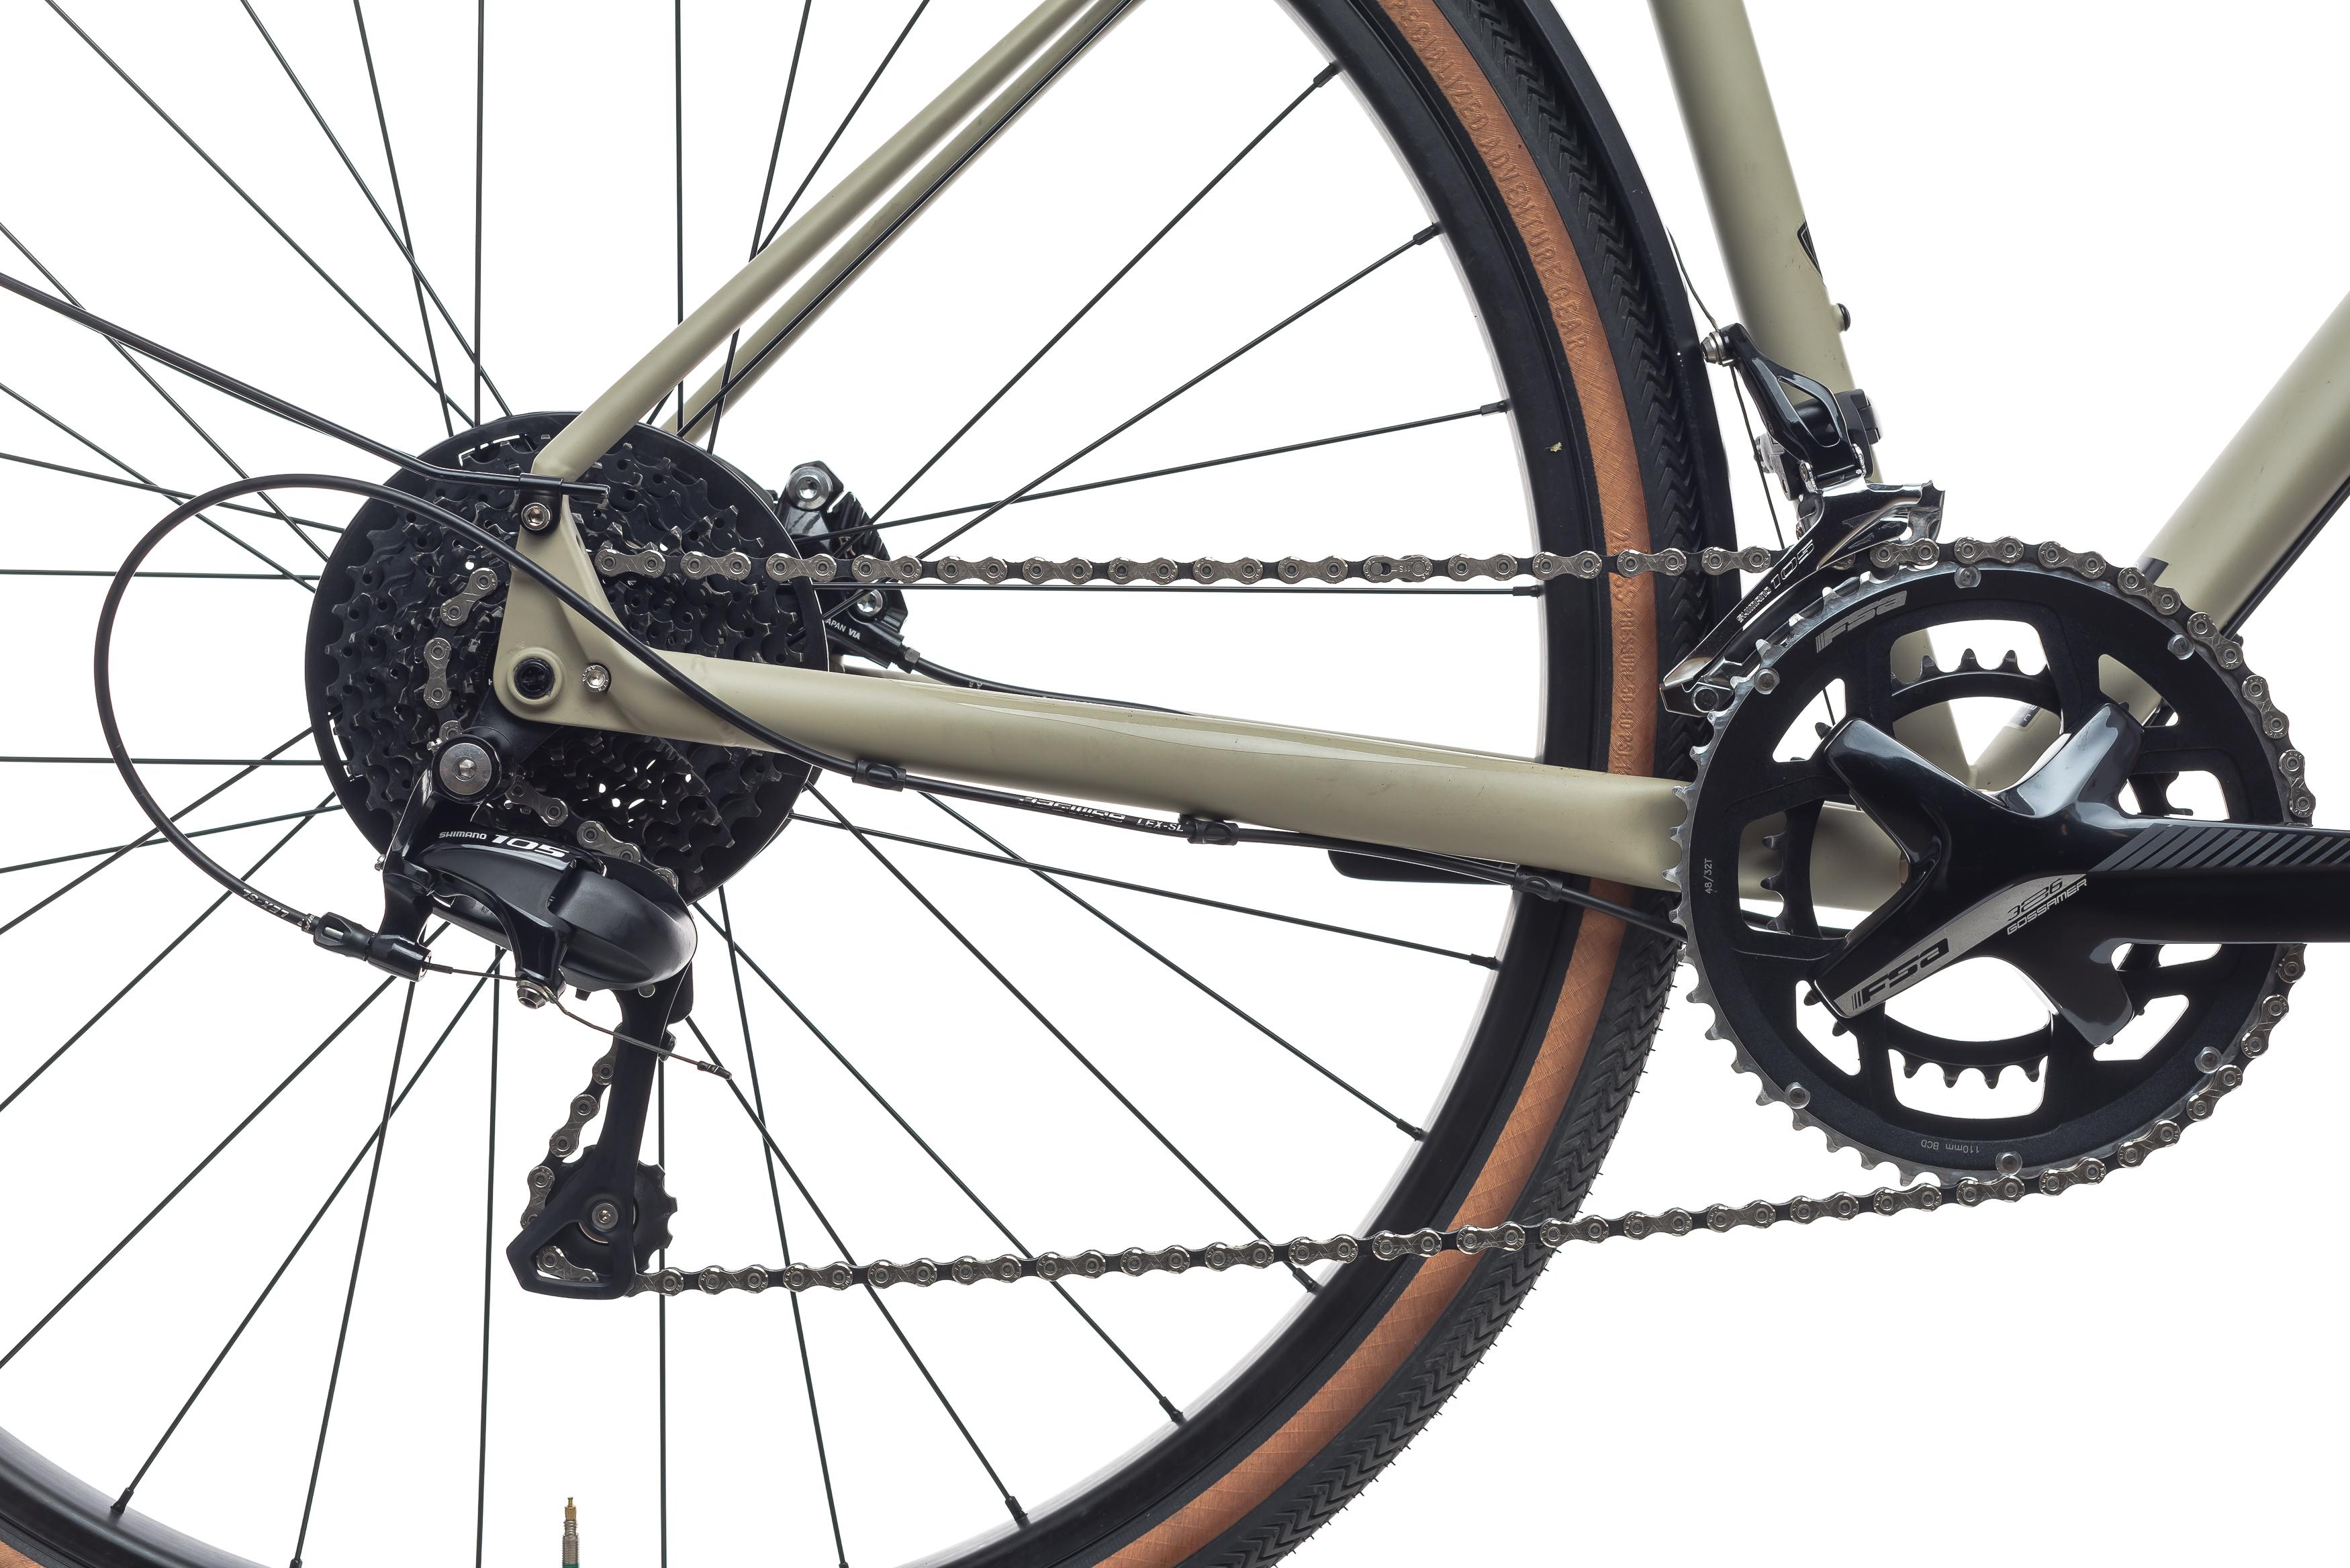 e14be45515d 2019 Specialized Sequoia Elite Adventure Touring Bike 54cm Steel Shimano 105